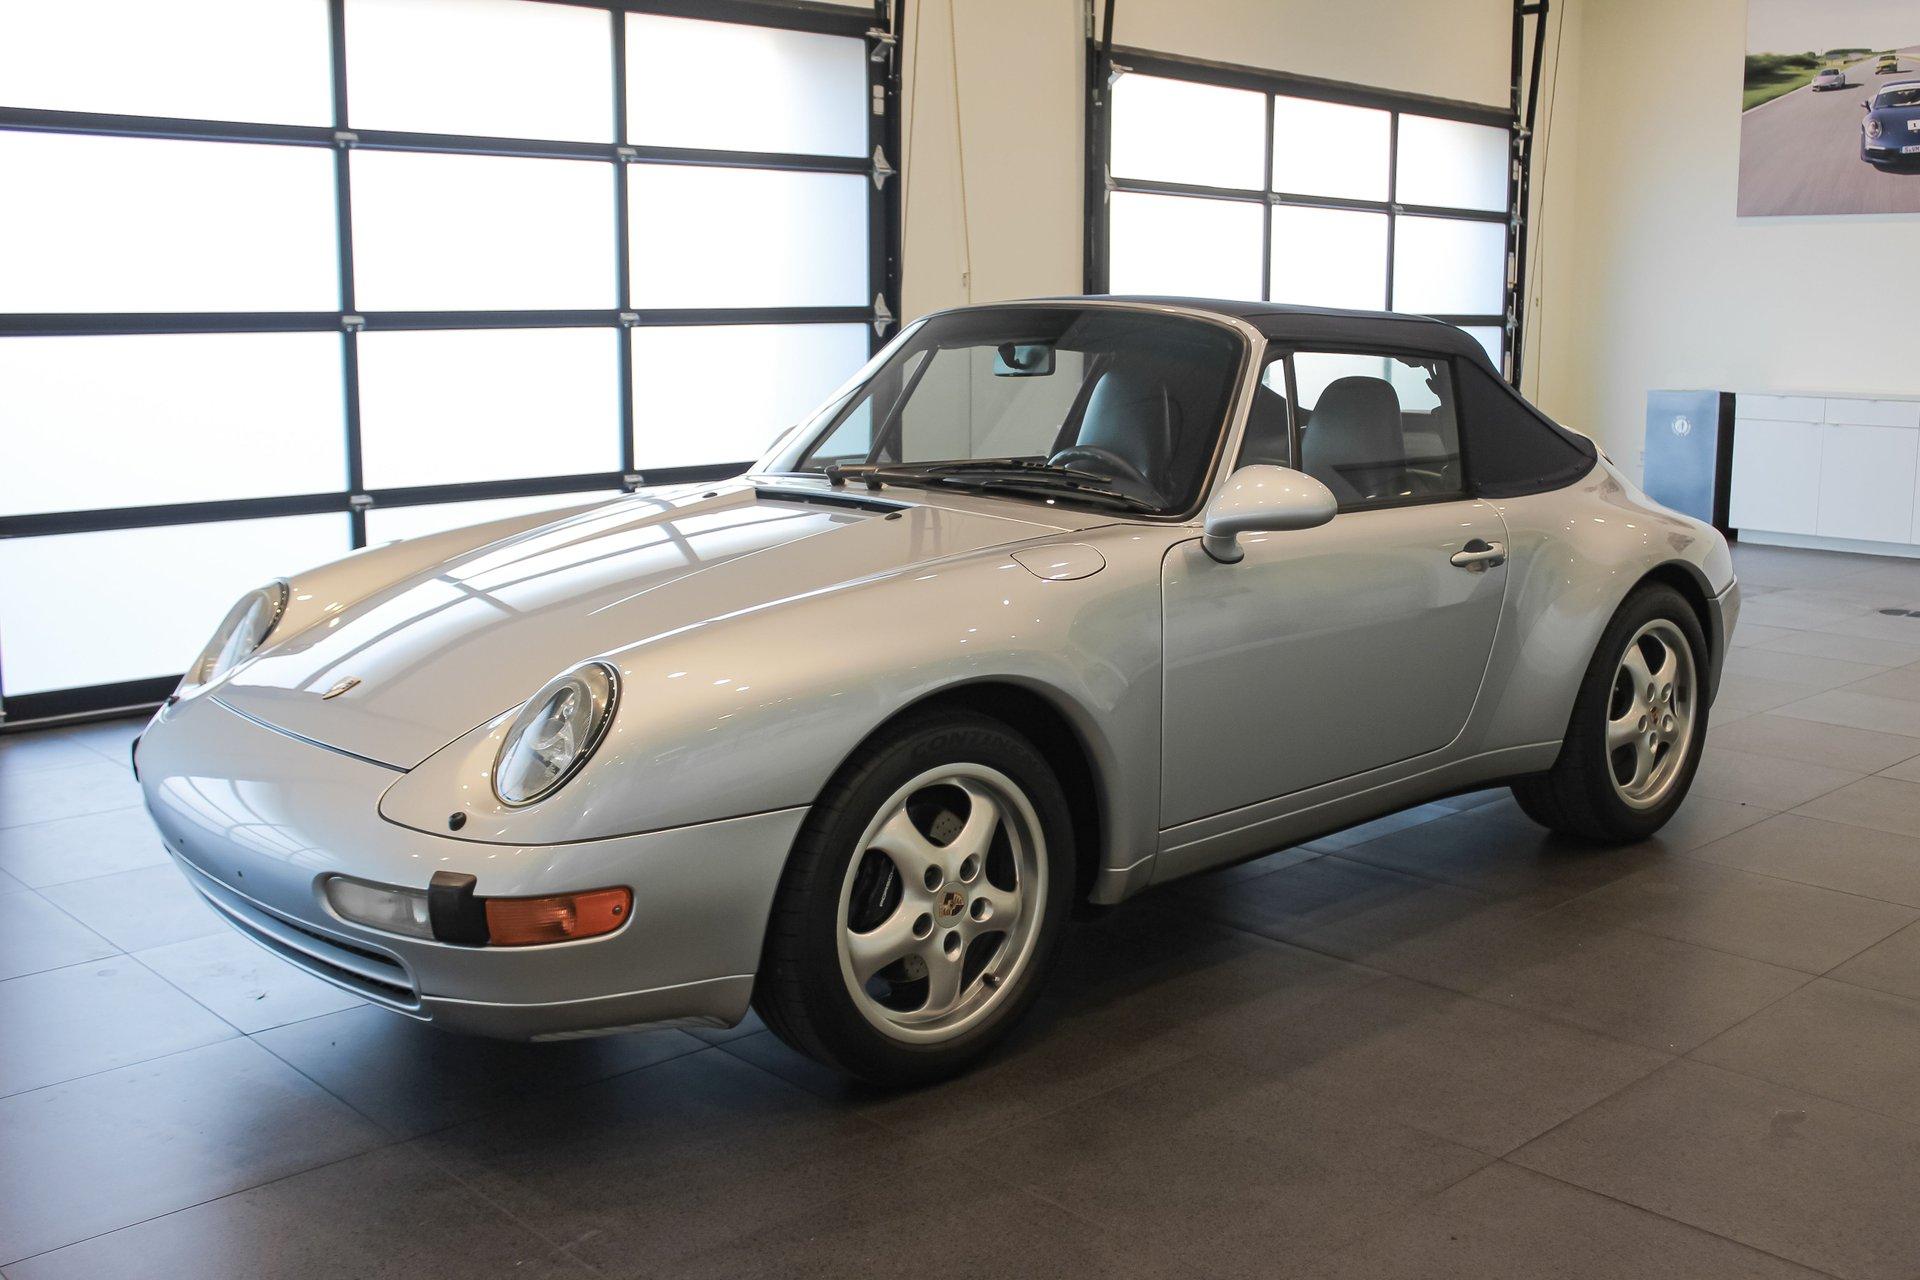 1995 Porsche 911 Carrera C2 Cab